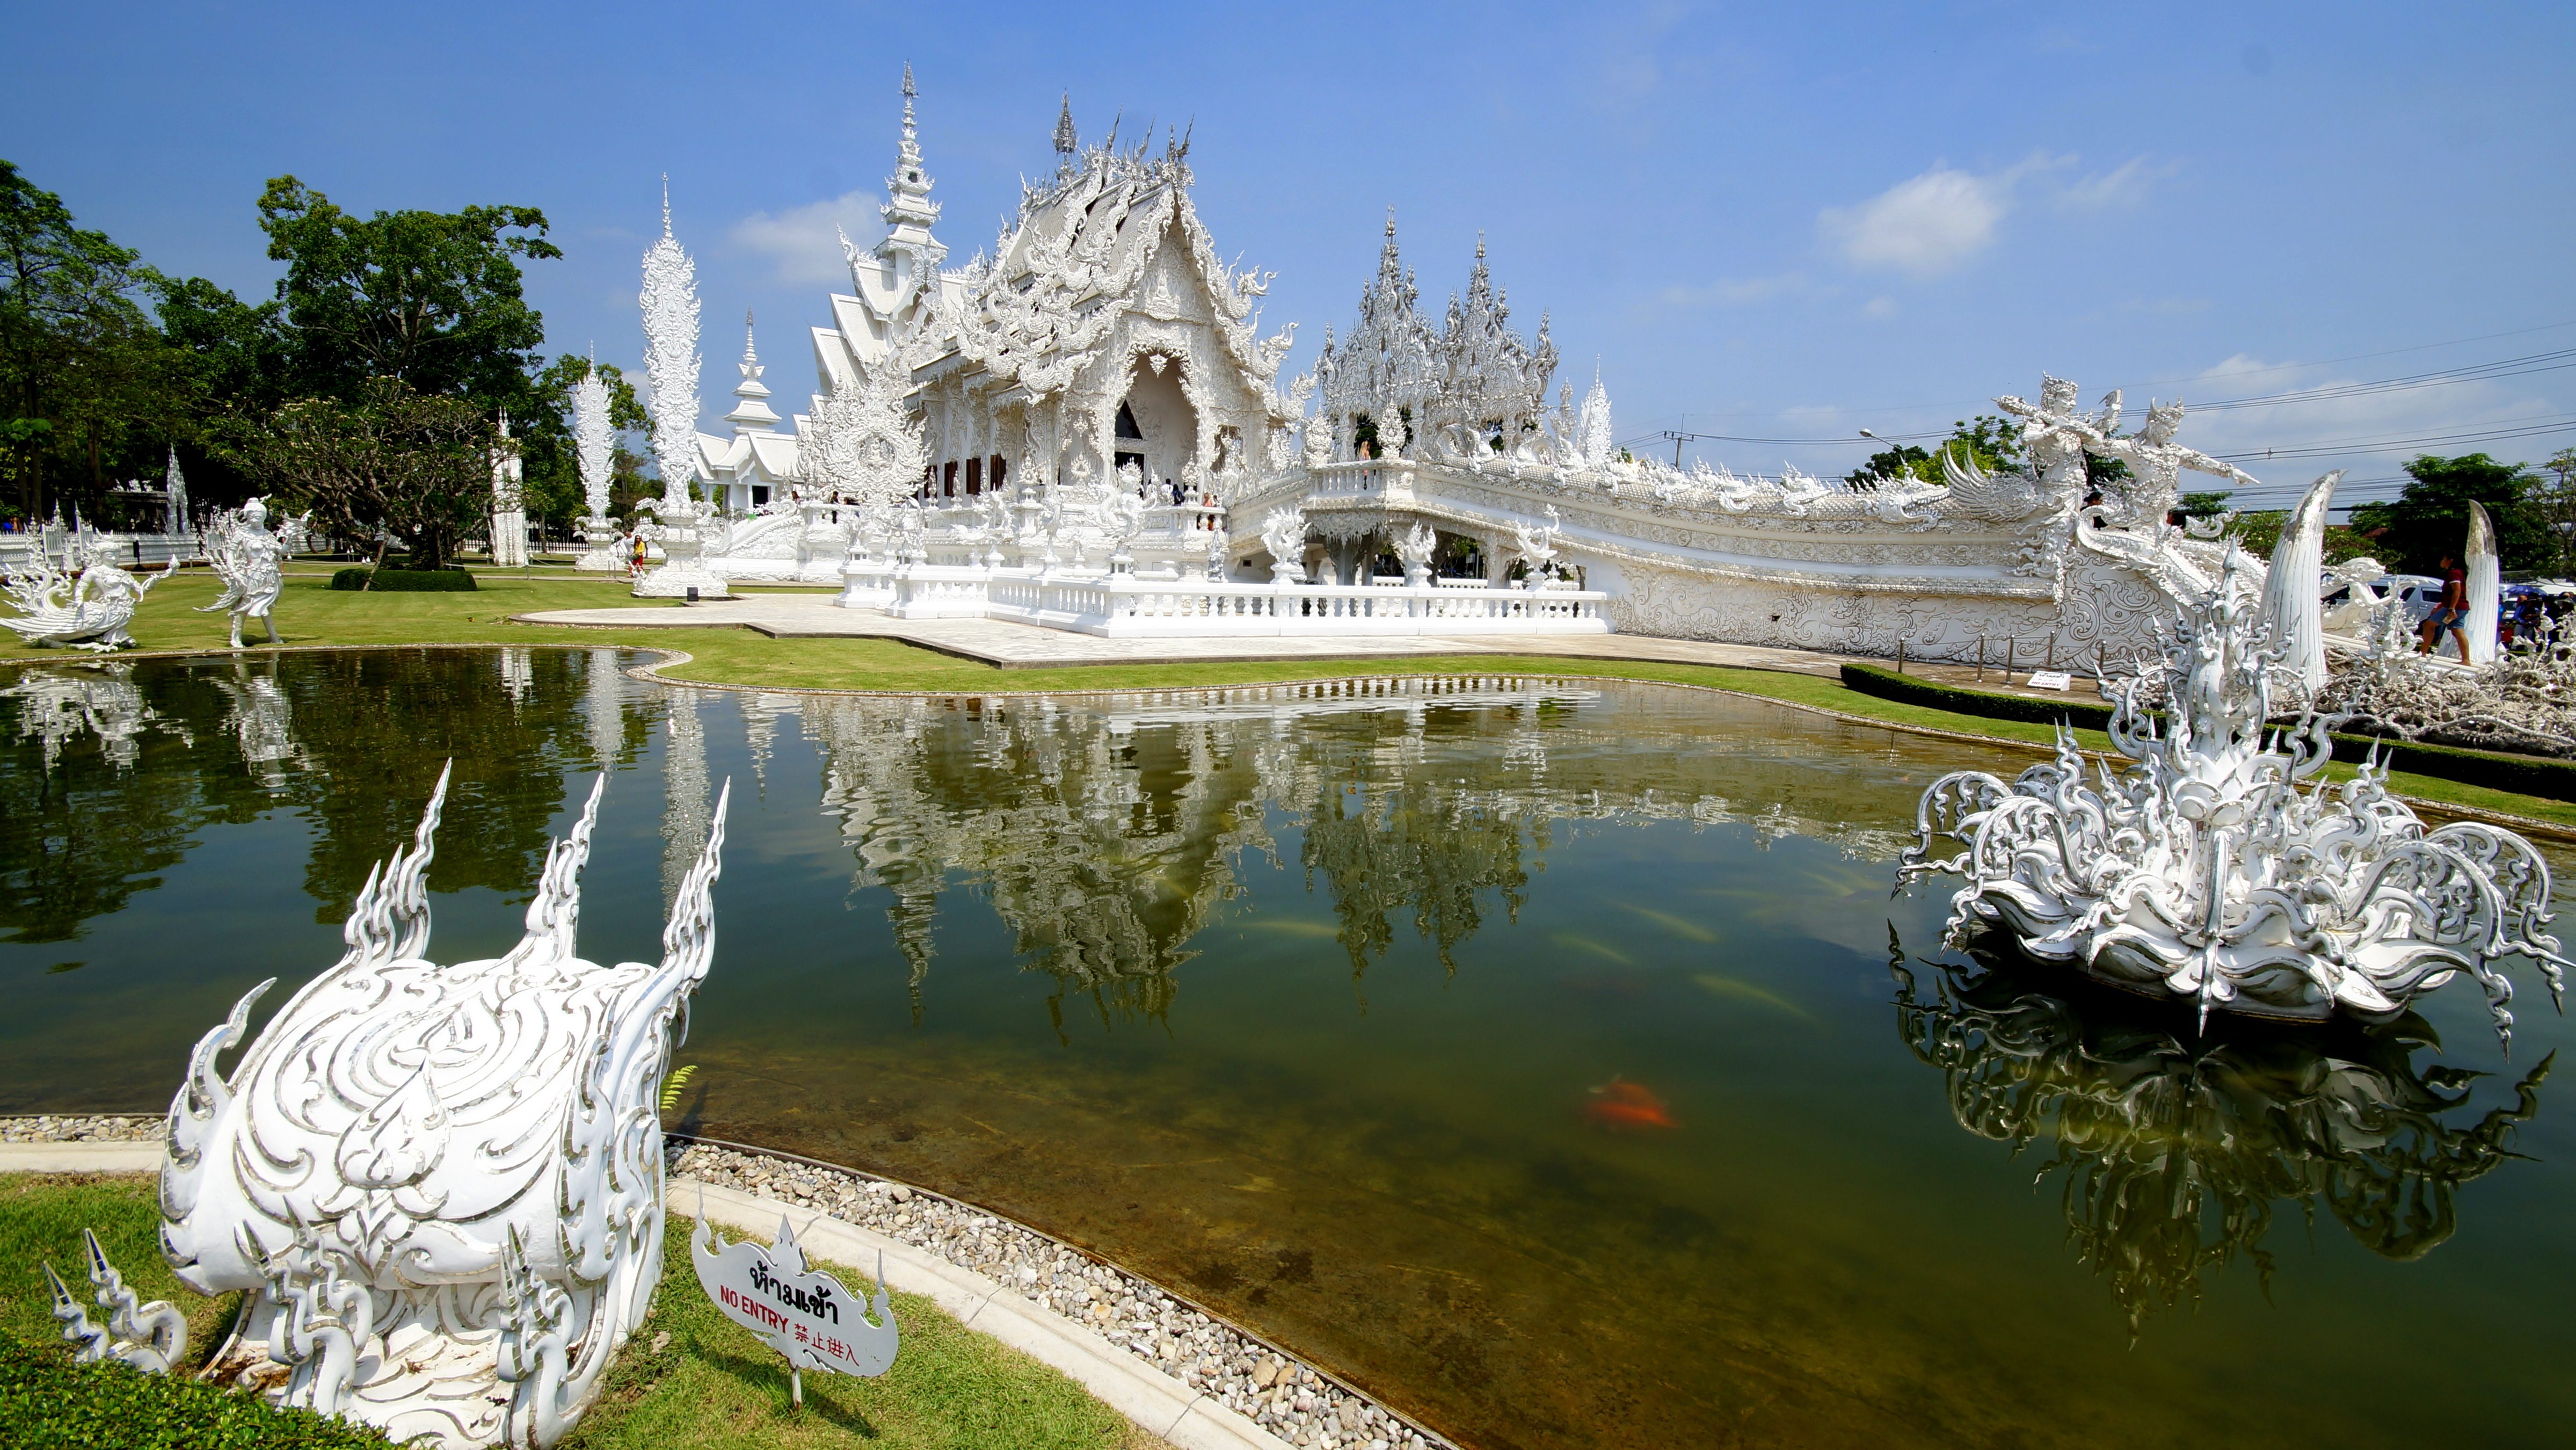 Von Chiang Mai nach Laos: White Temple, Black House und Golden Triangle | katetravels